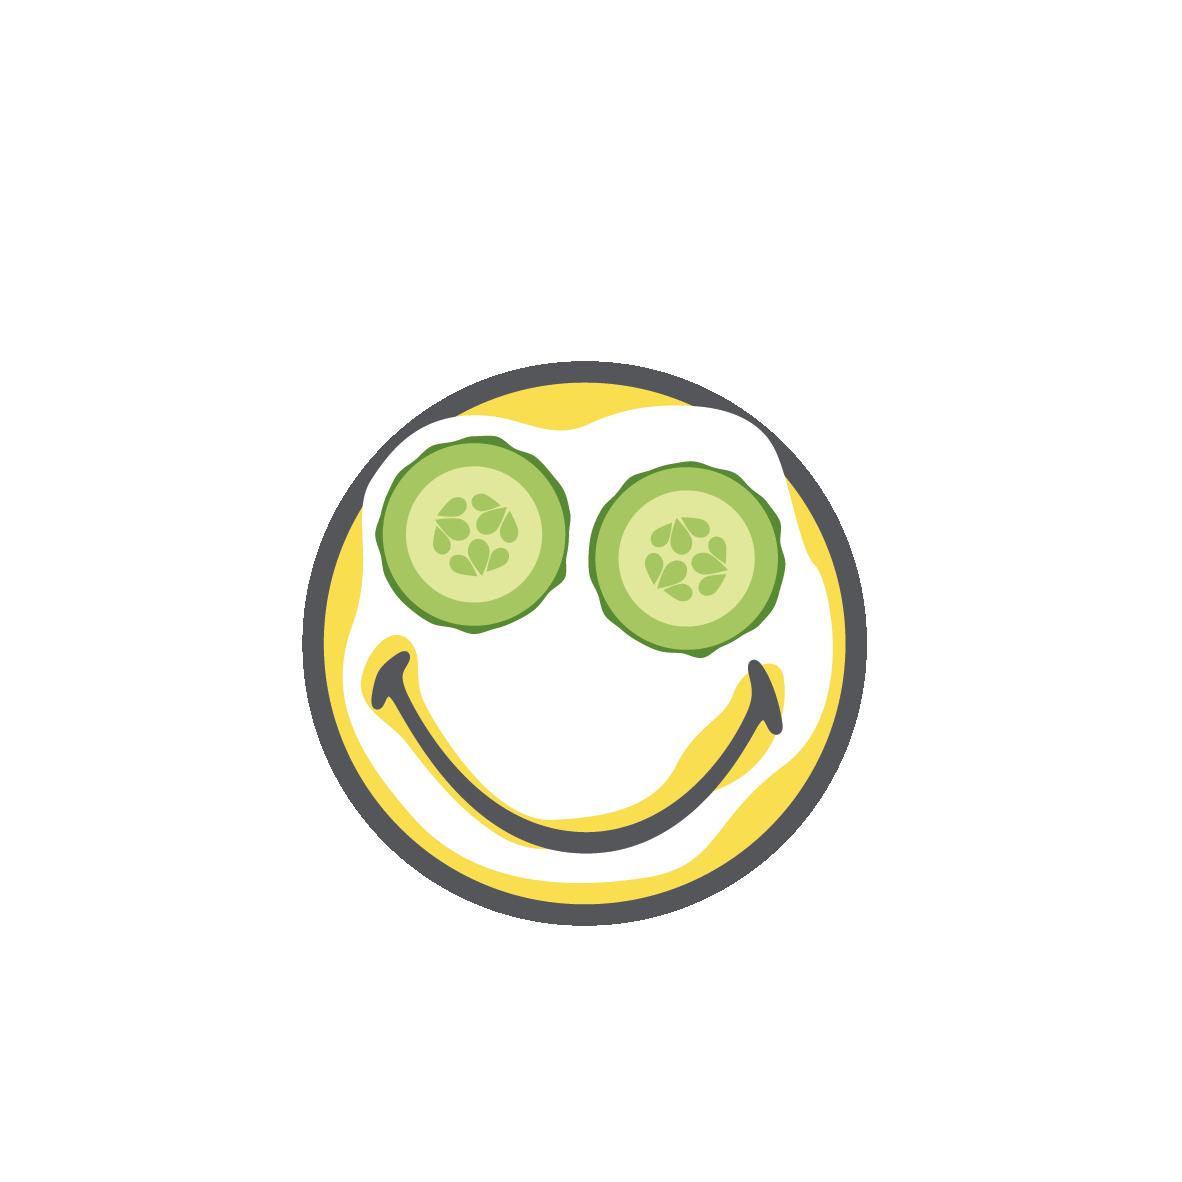 Ciaté X SmileyWorld messages sticker-5